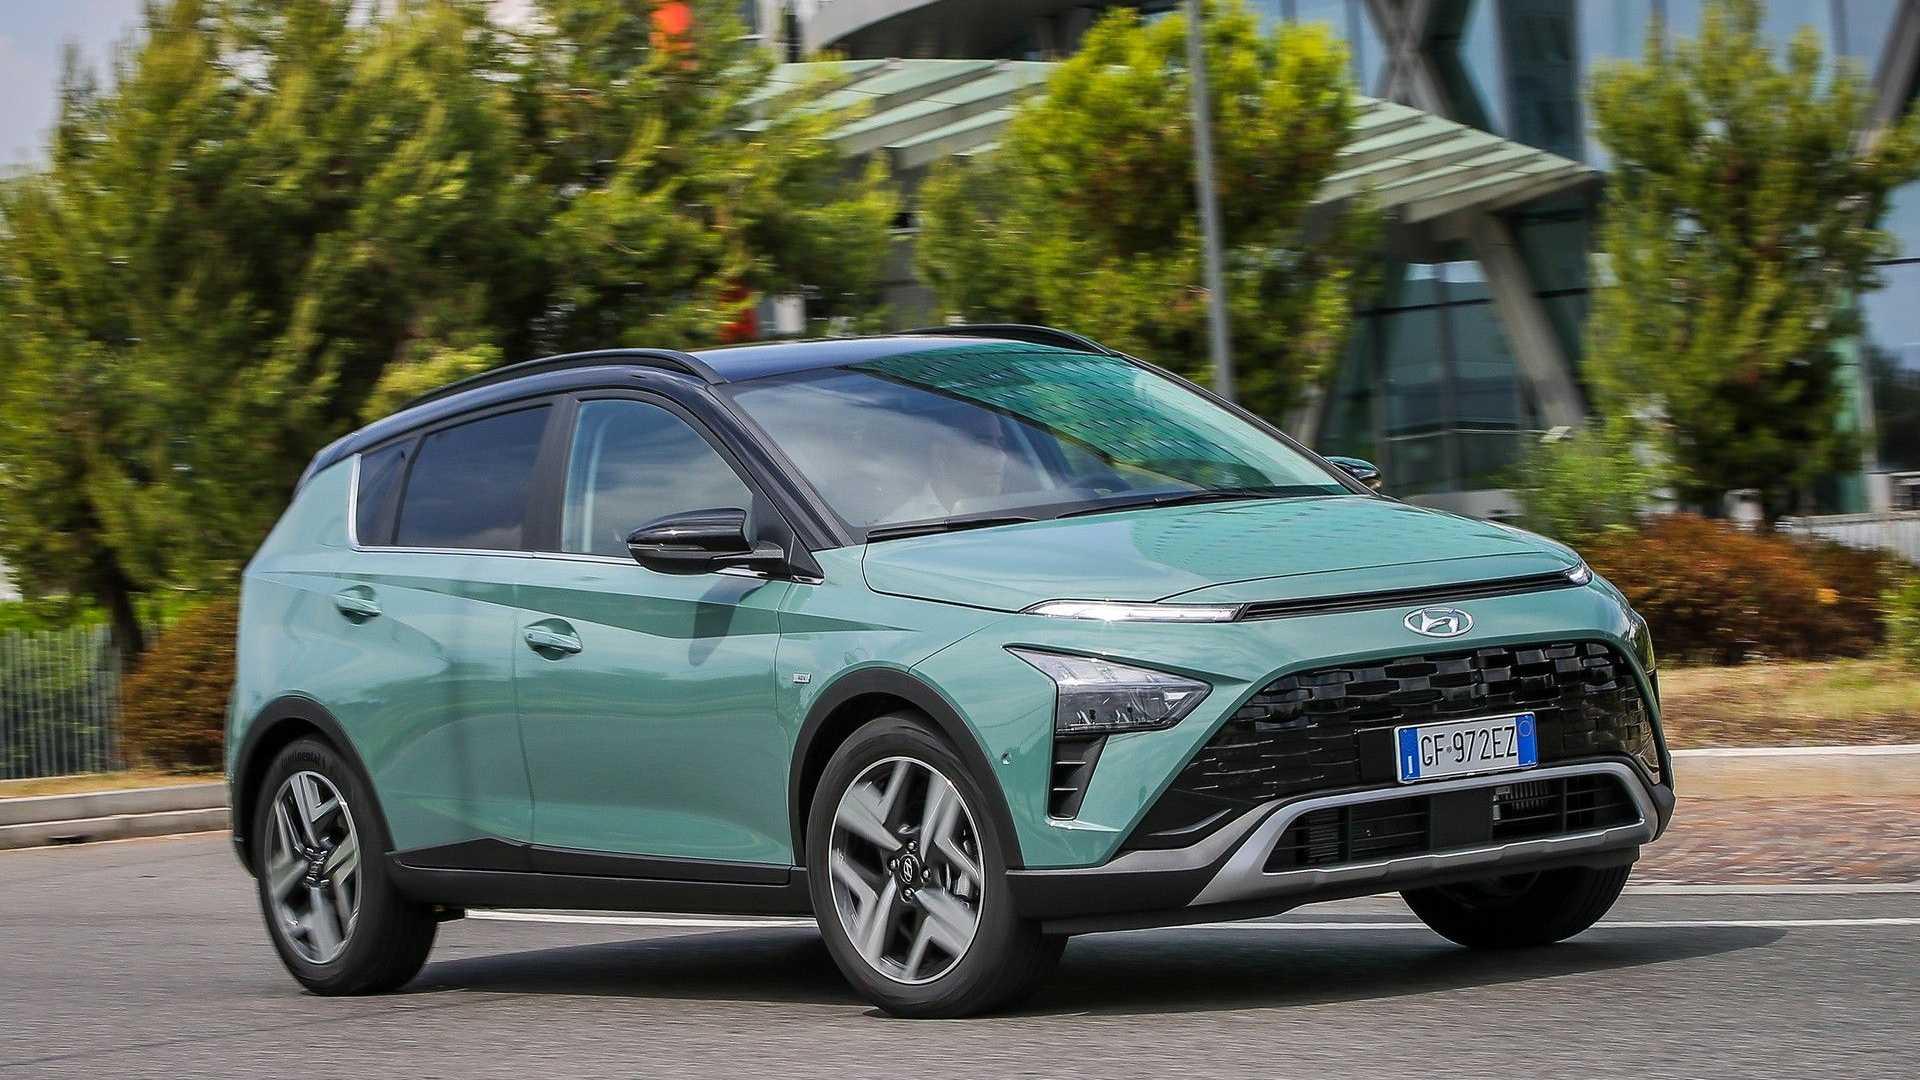 Hyundai Bayon, porte aperte, 18-19 e 25-26 settembre, 15.300 euro